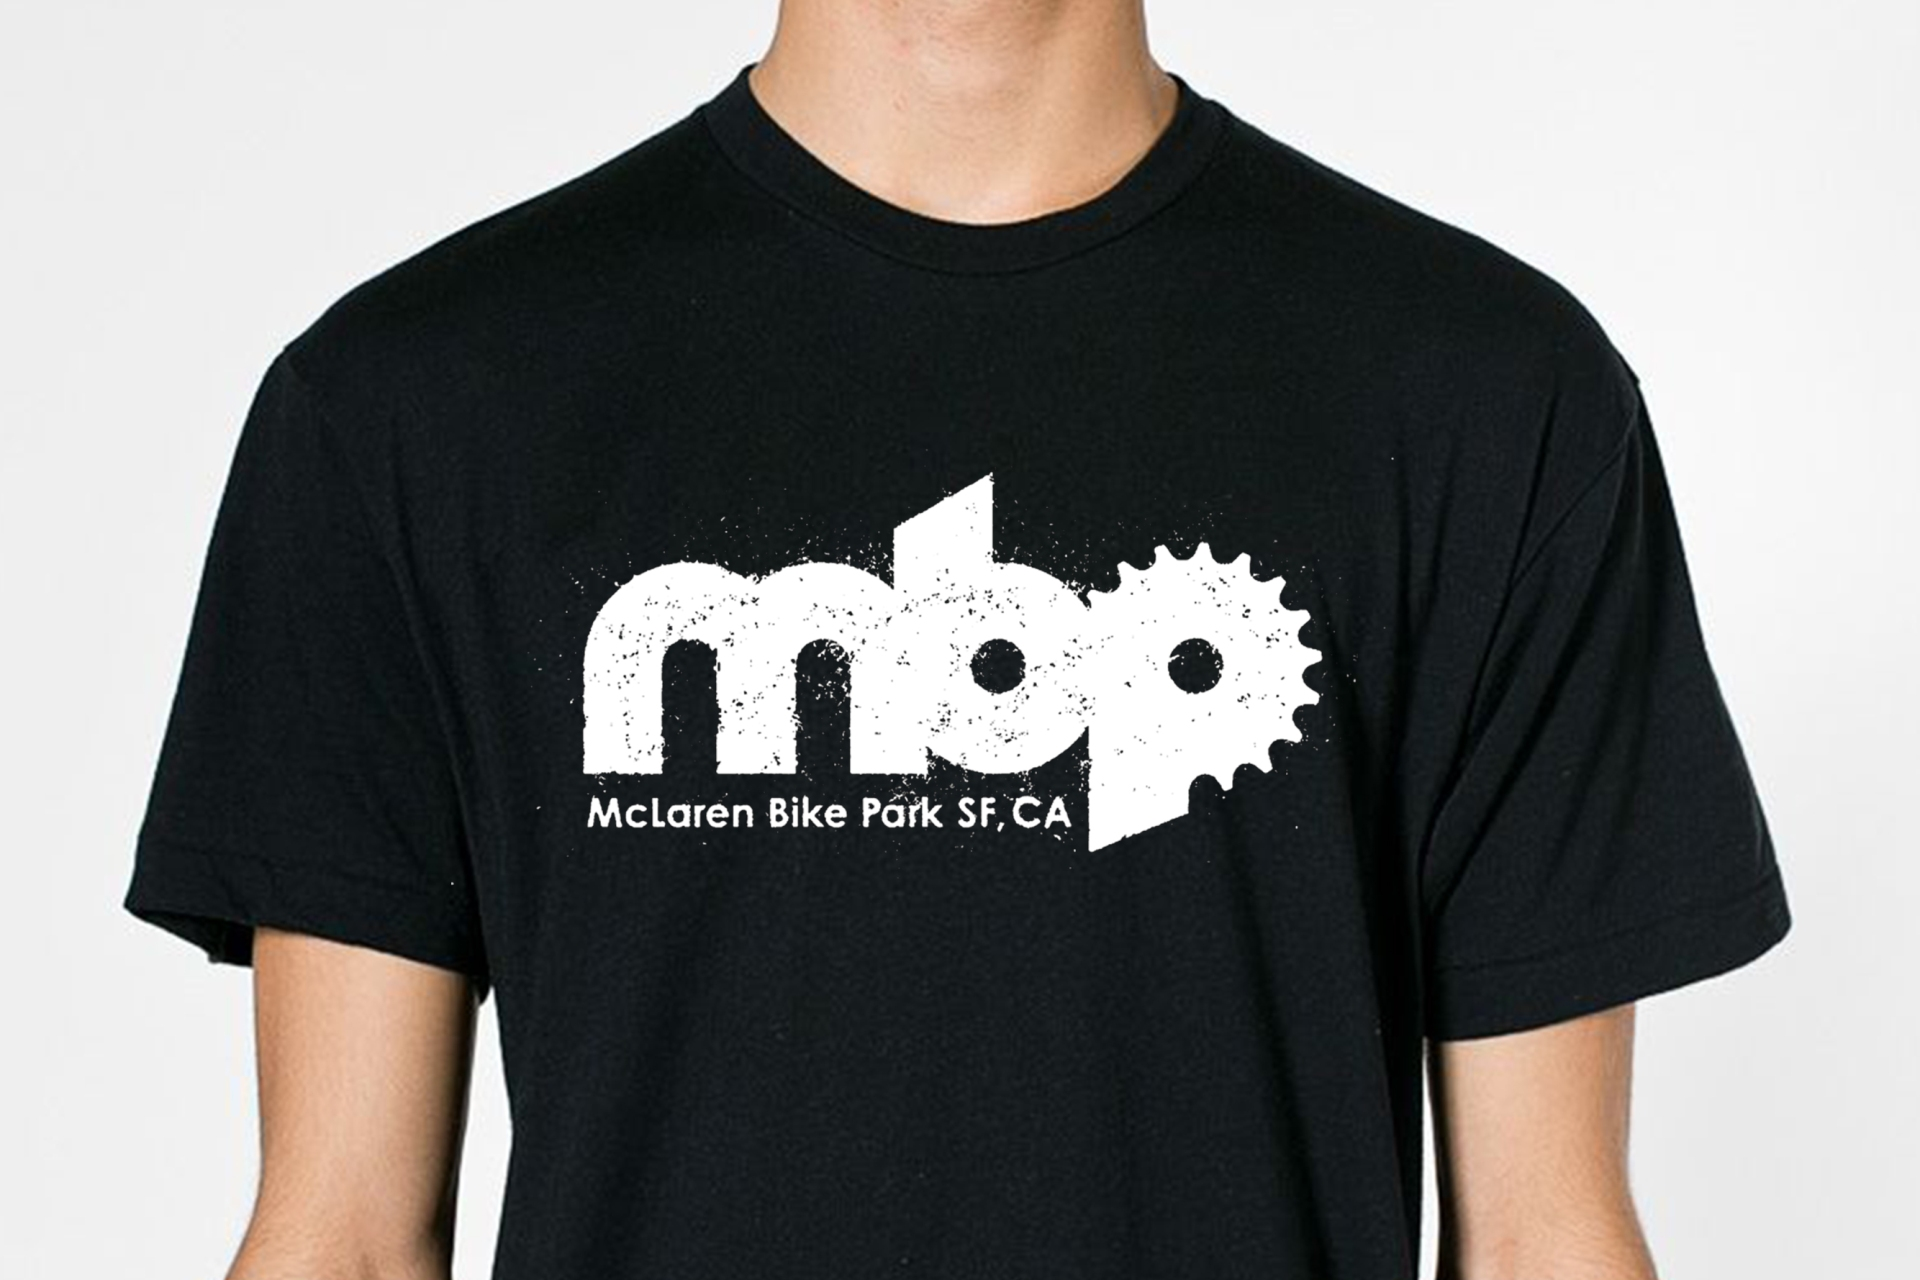 mbp_original_t_2x3.jpg